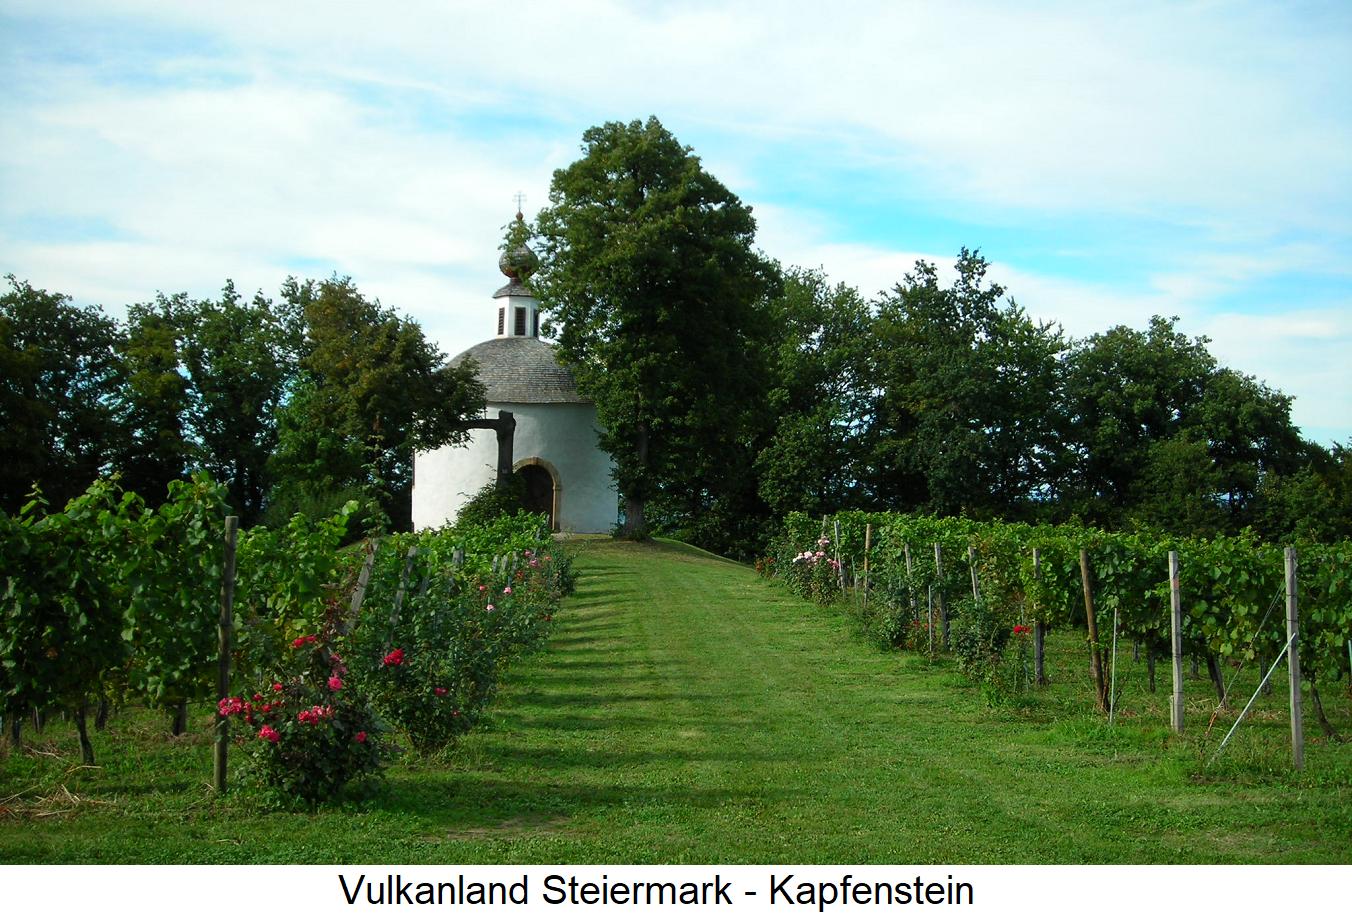 Vulkanland Steiermark - Kapfenstein